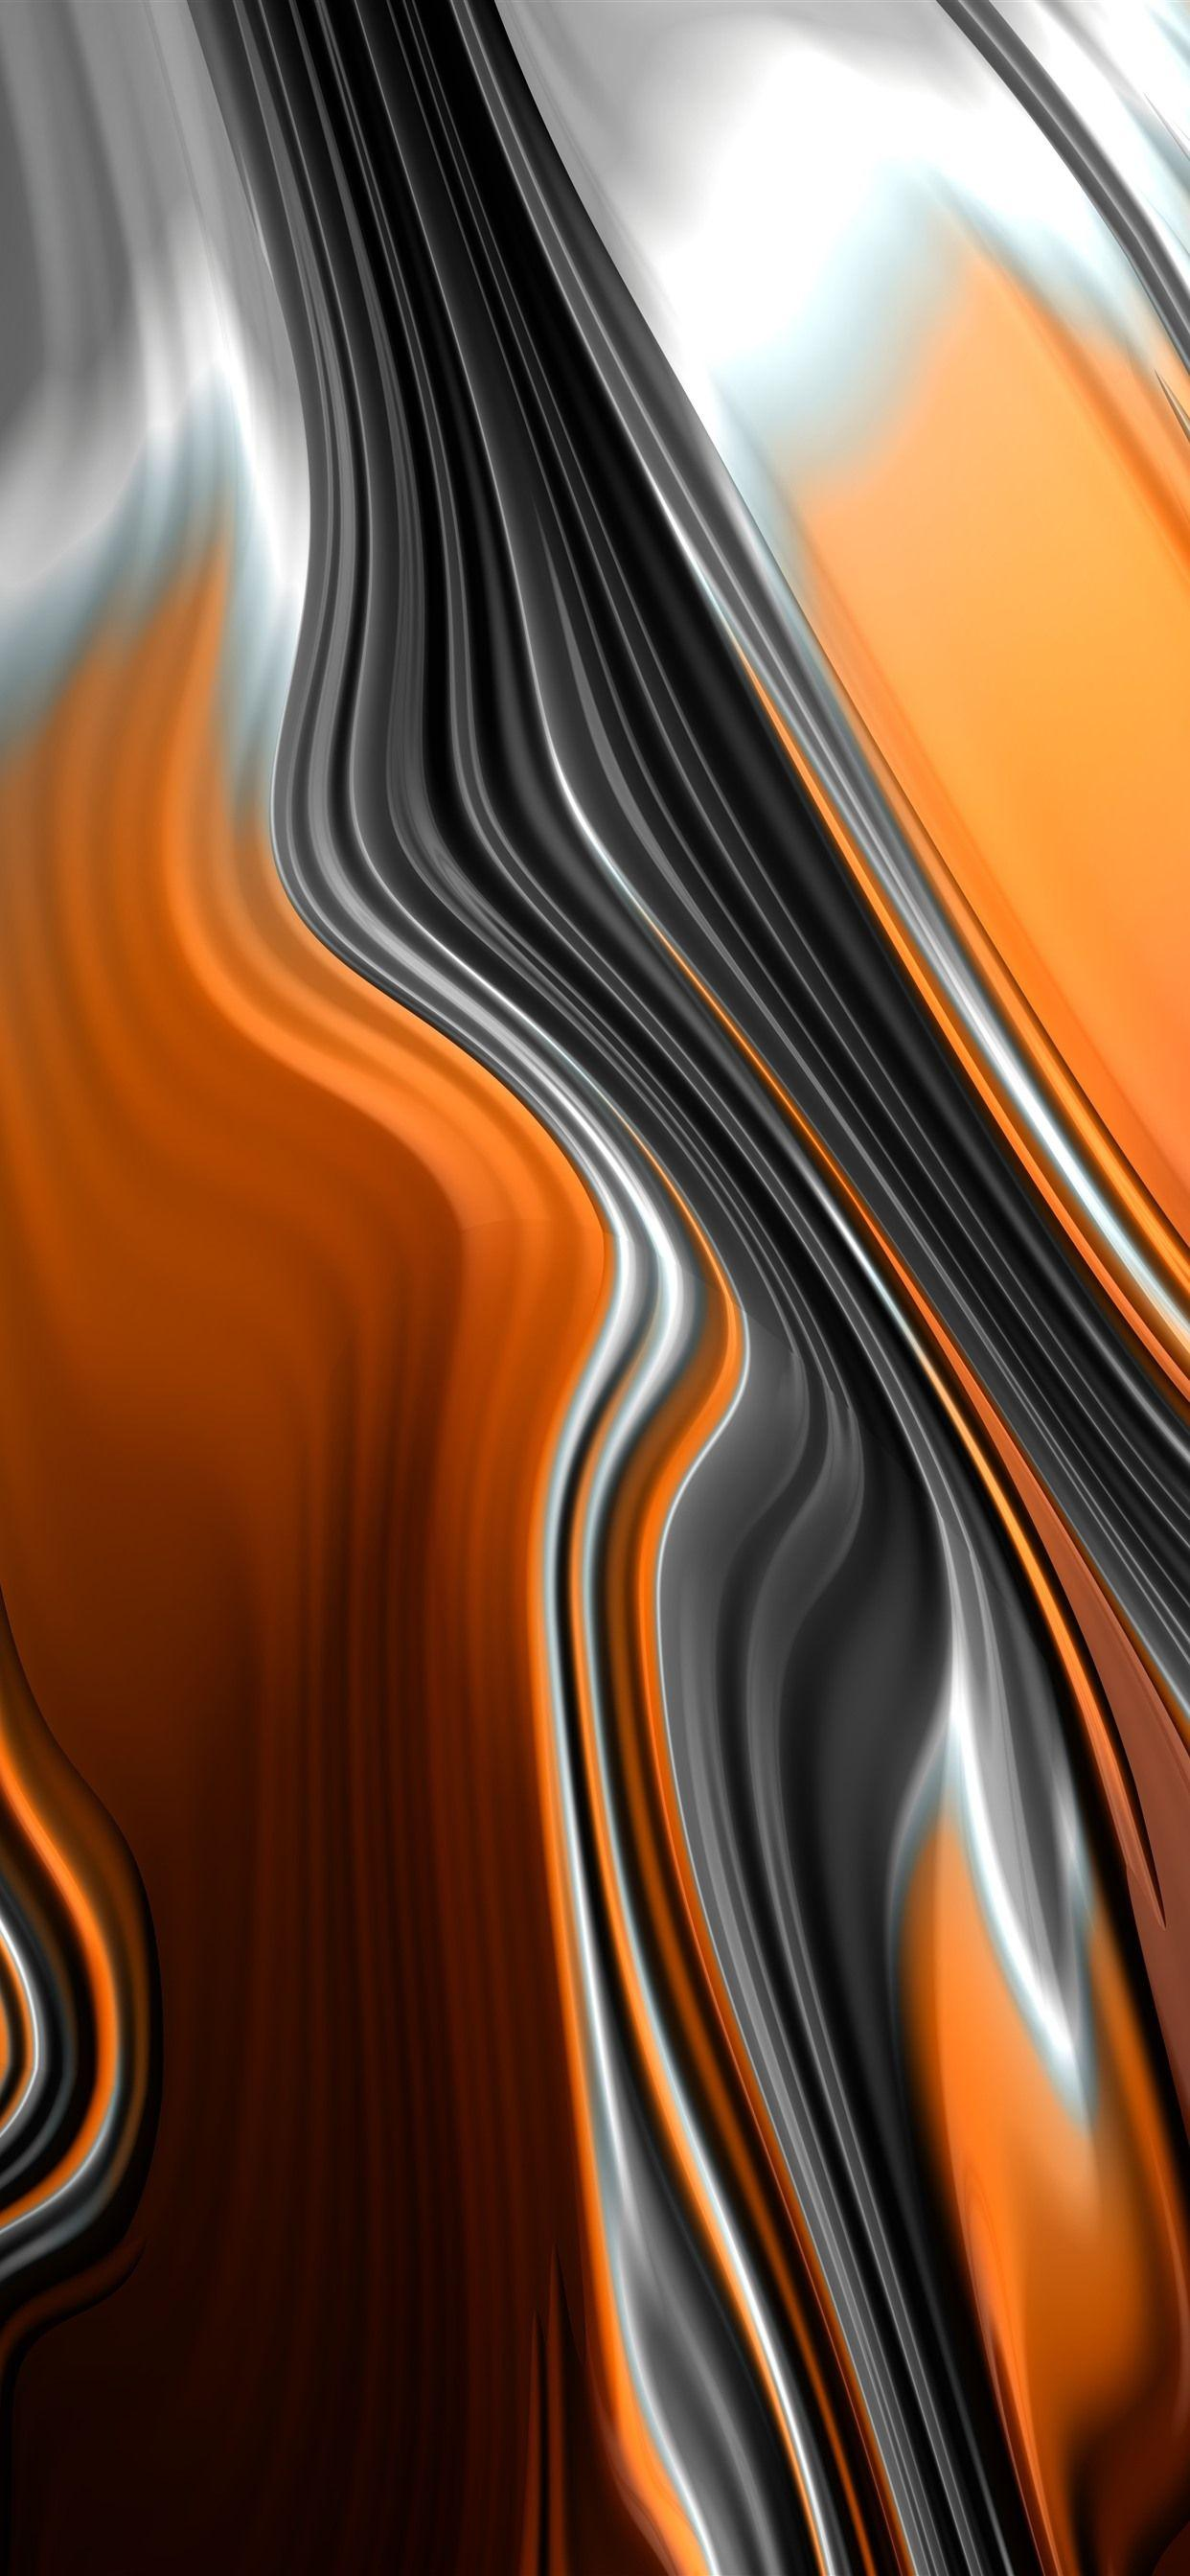 iPhone Black Orange Wallpapers - Wallpaper Cave